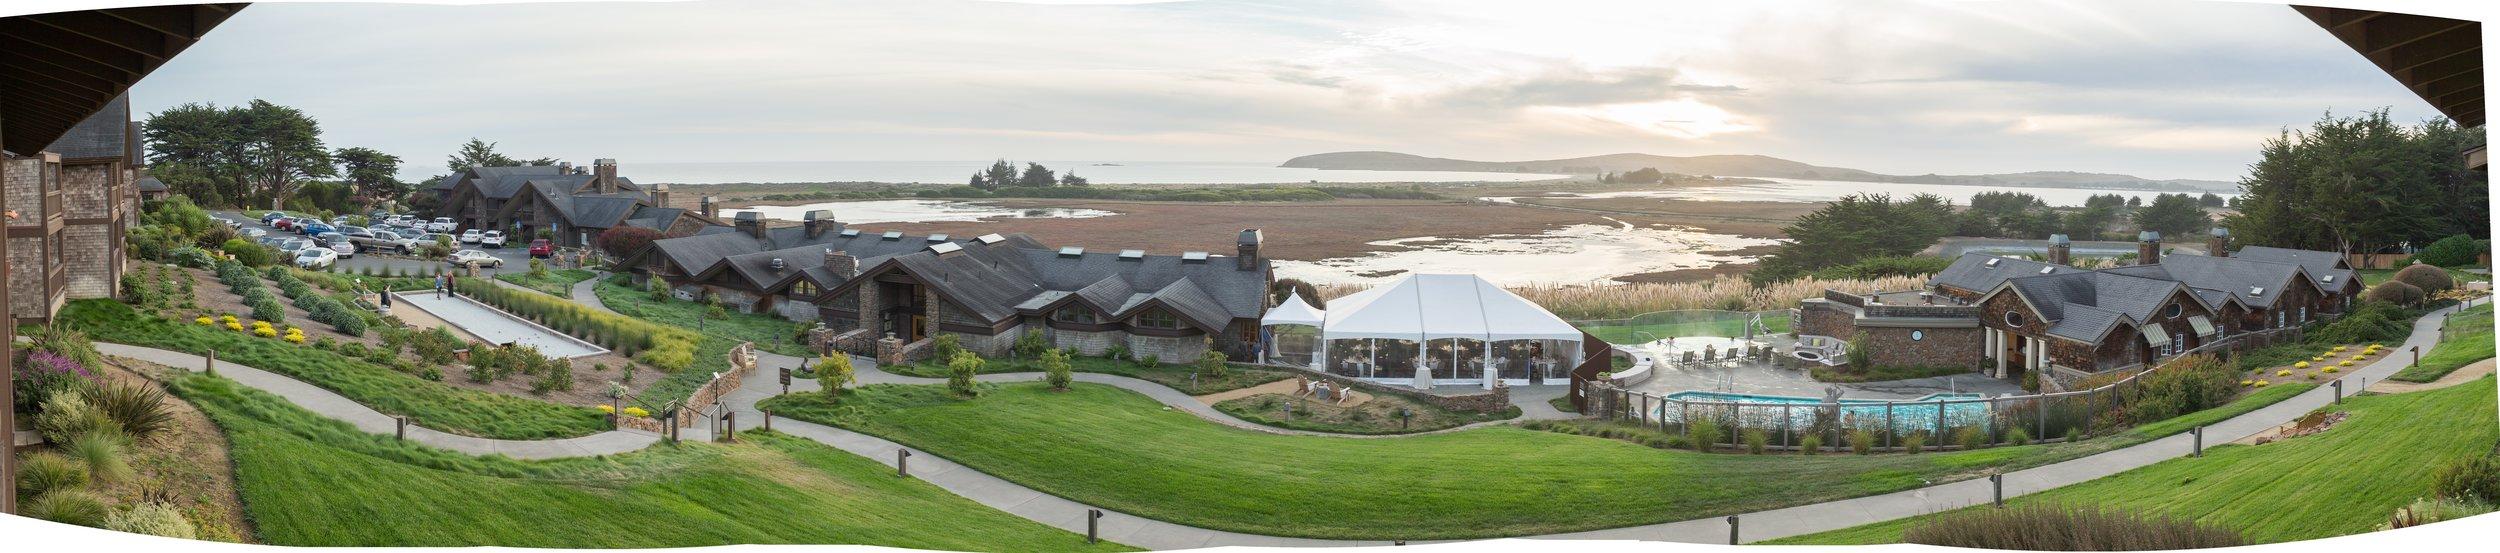 20151024 S&B at Bodega Bay Lodge-685.jpg